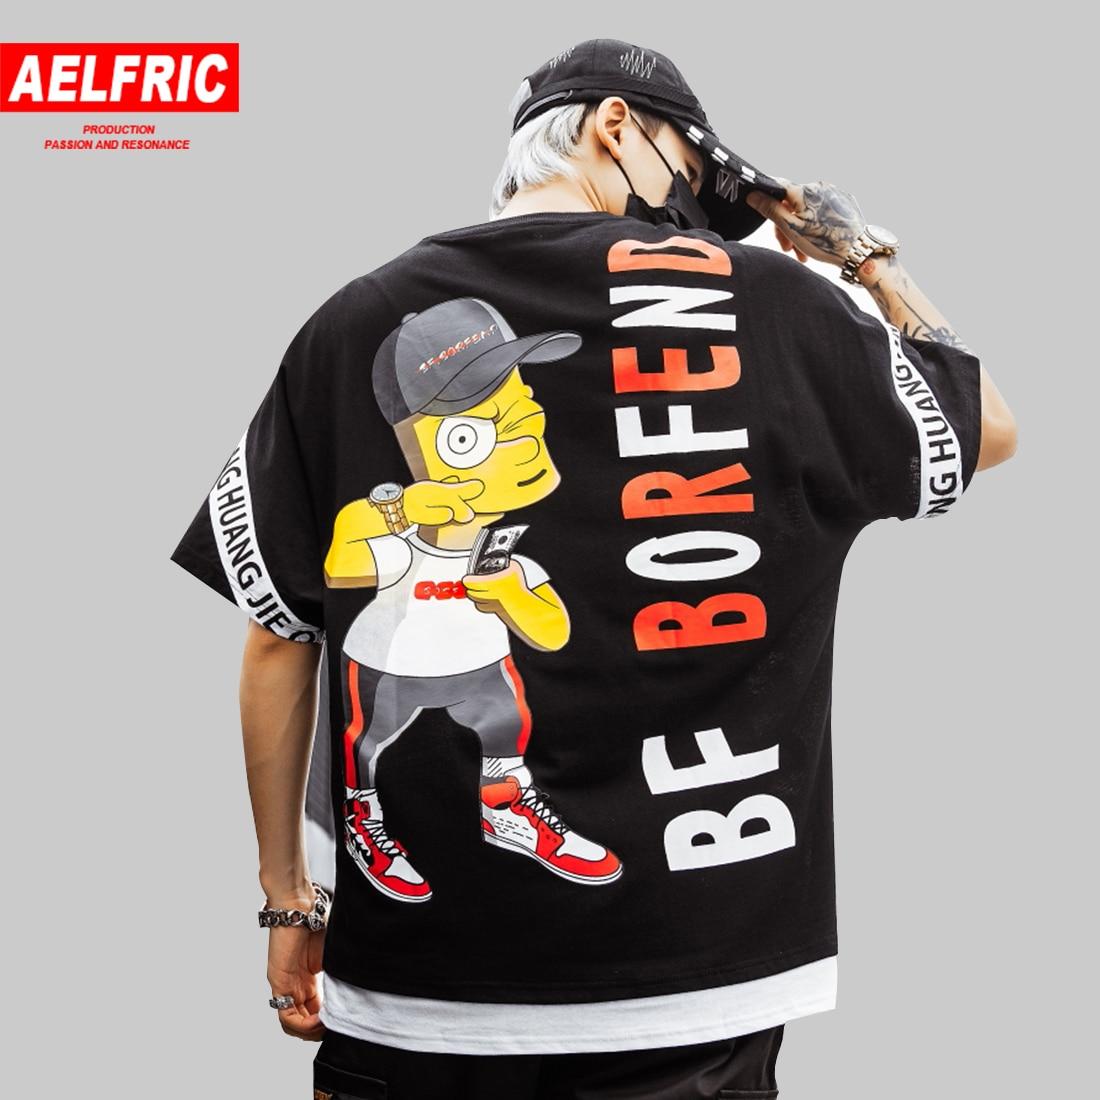 AELFRIC シンプソンプリントストリート Tシャツ男性ヒップホップカジュアル半袖夏パッチワークファッション原宿トップス男性 Tシャツ  グループ上の メンズ服 からの Tシャツ の中 1